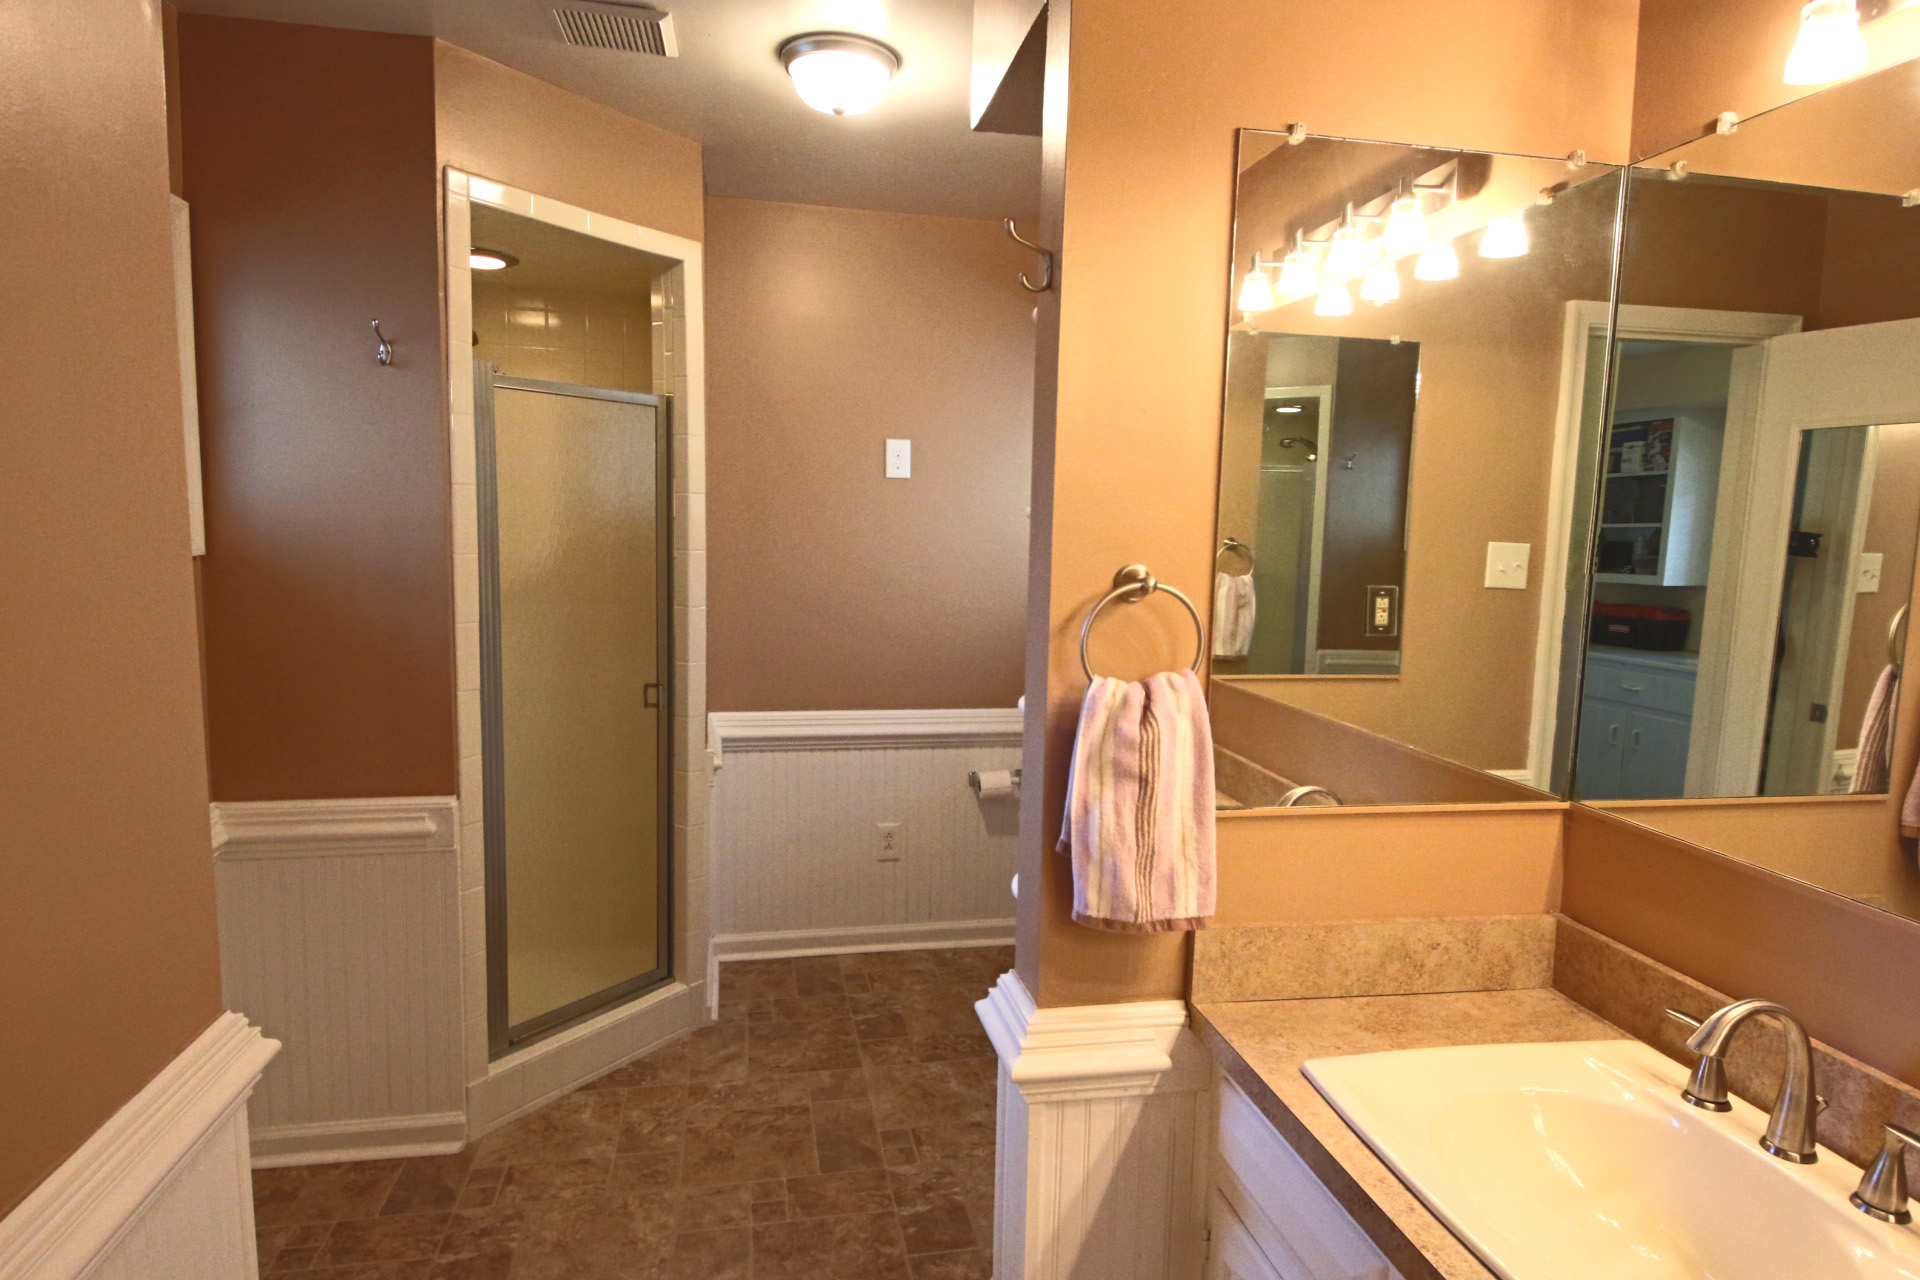 15. Downstairs Bathroom